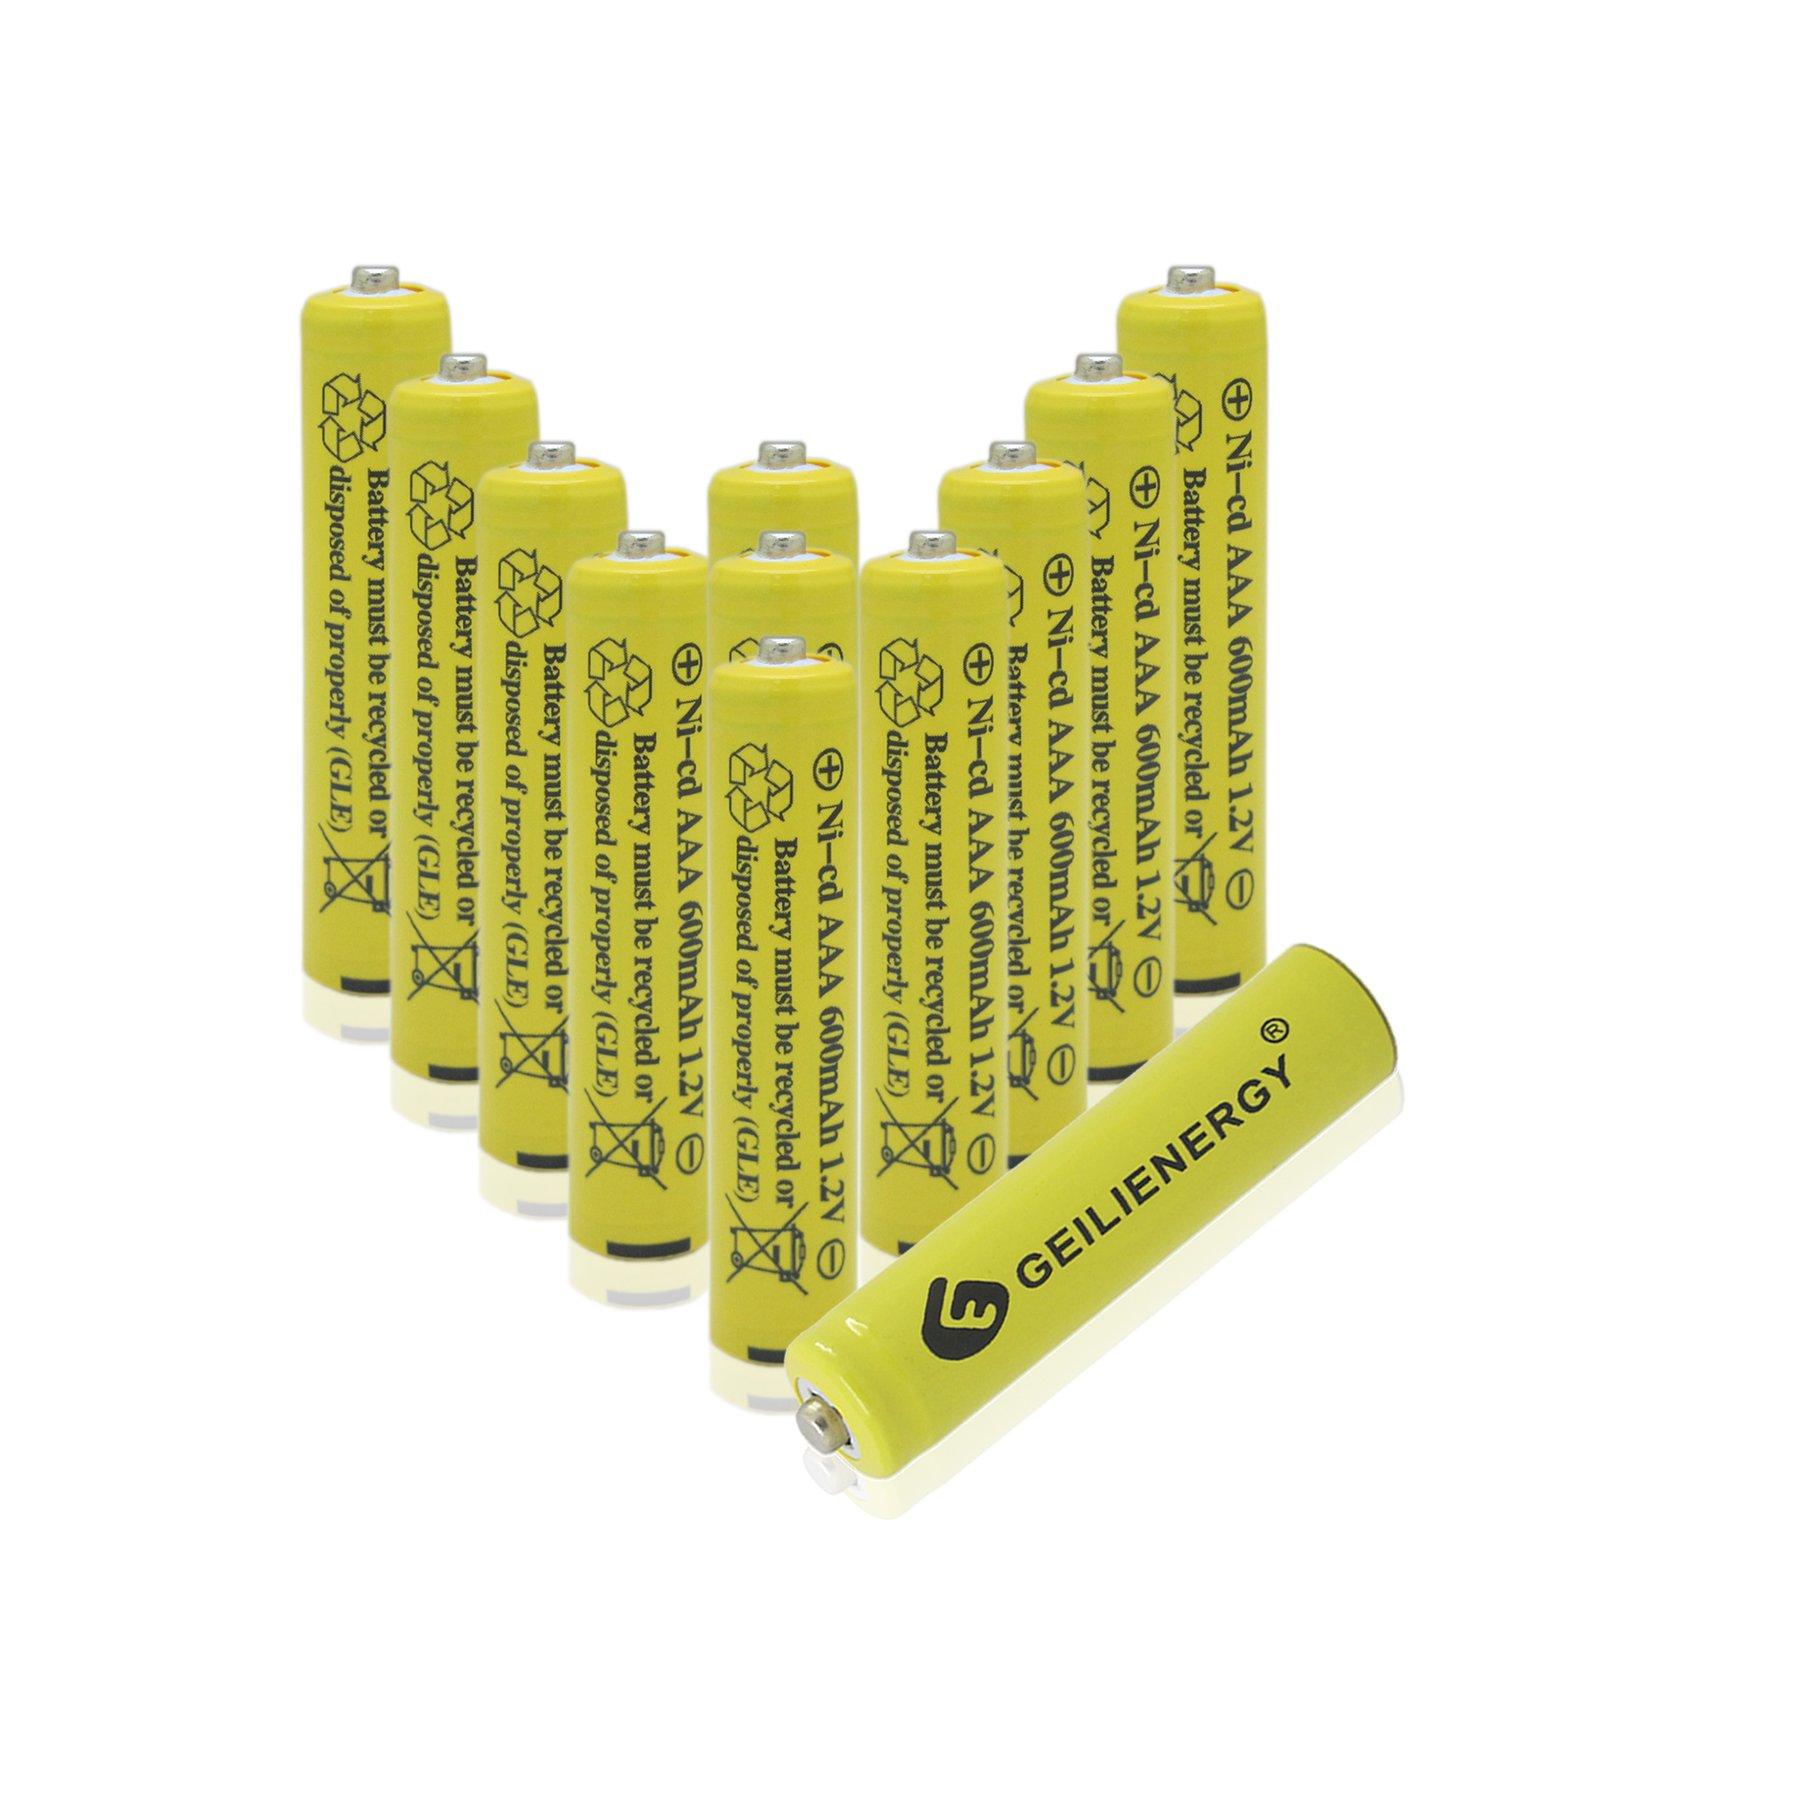 GEILIENERGY NiCd AAA 1.2V 600mAh Triple A Rechargeable Batteries for Solar light Solar Lamp Garden Light(12 PCS)